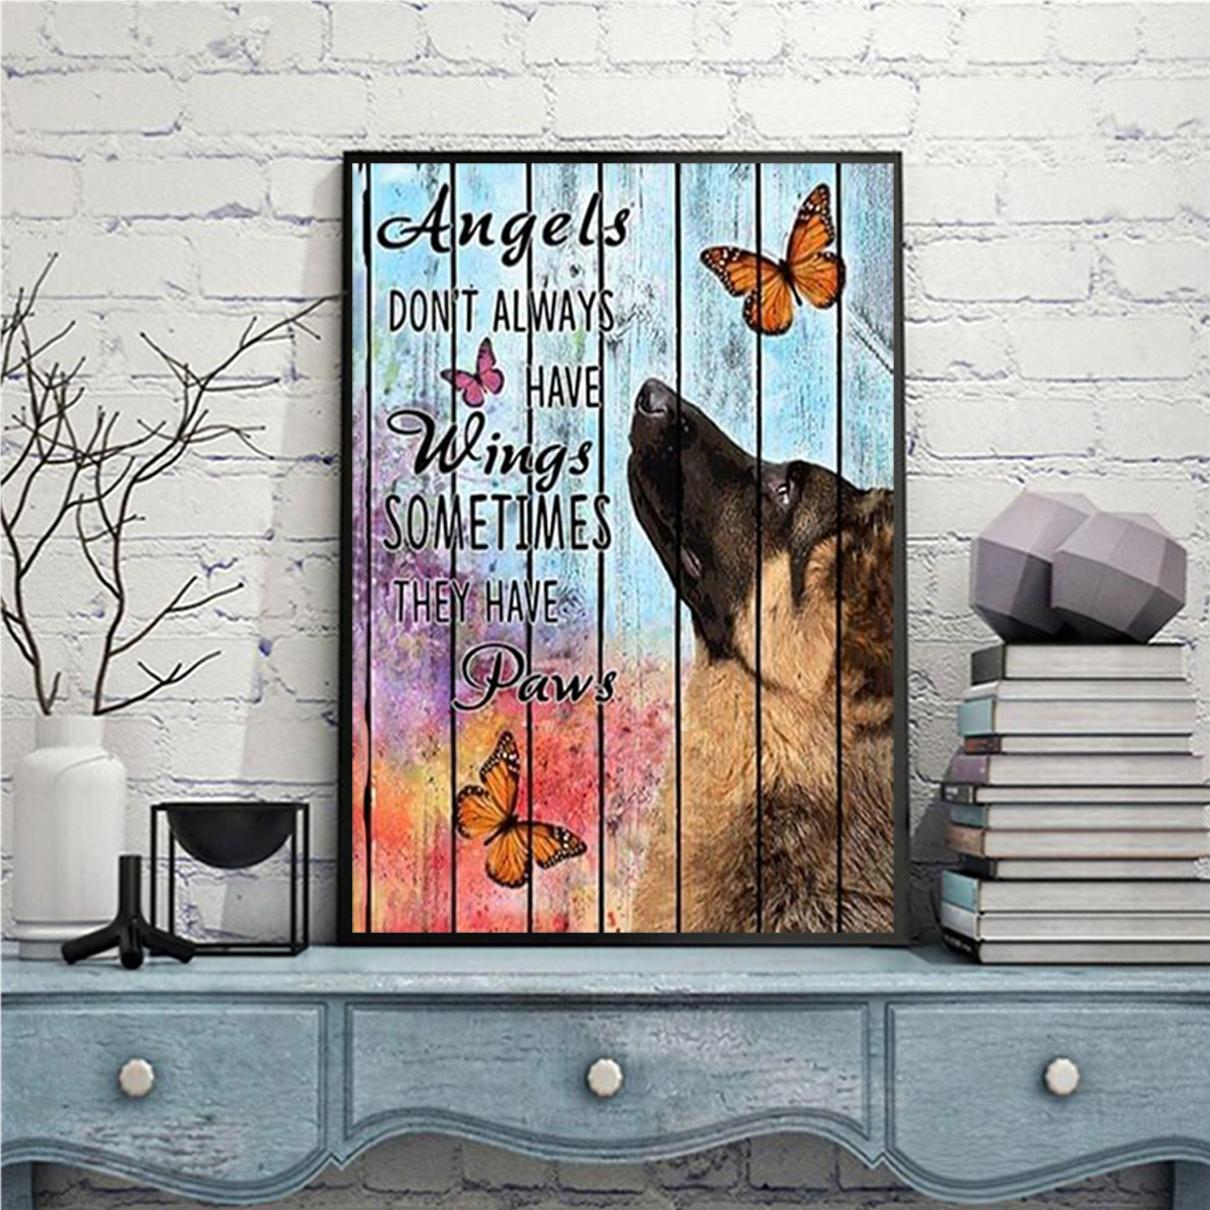 German shepherd angels don't always have wings poster A2